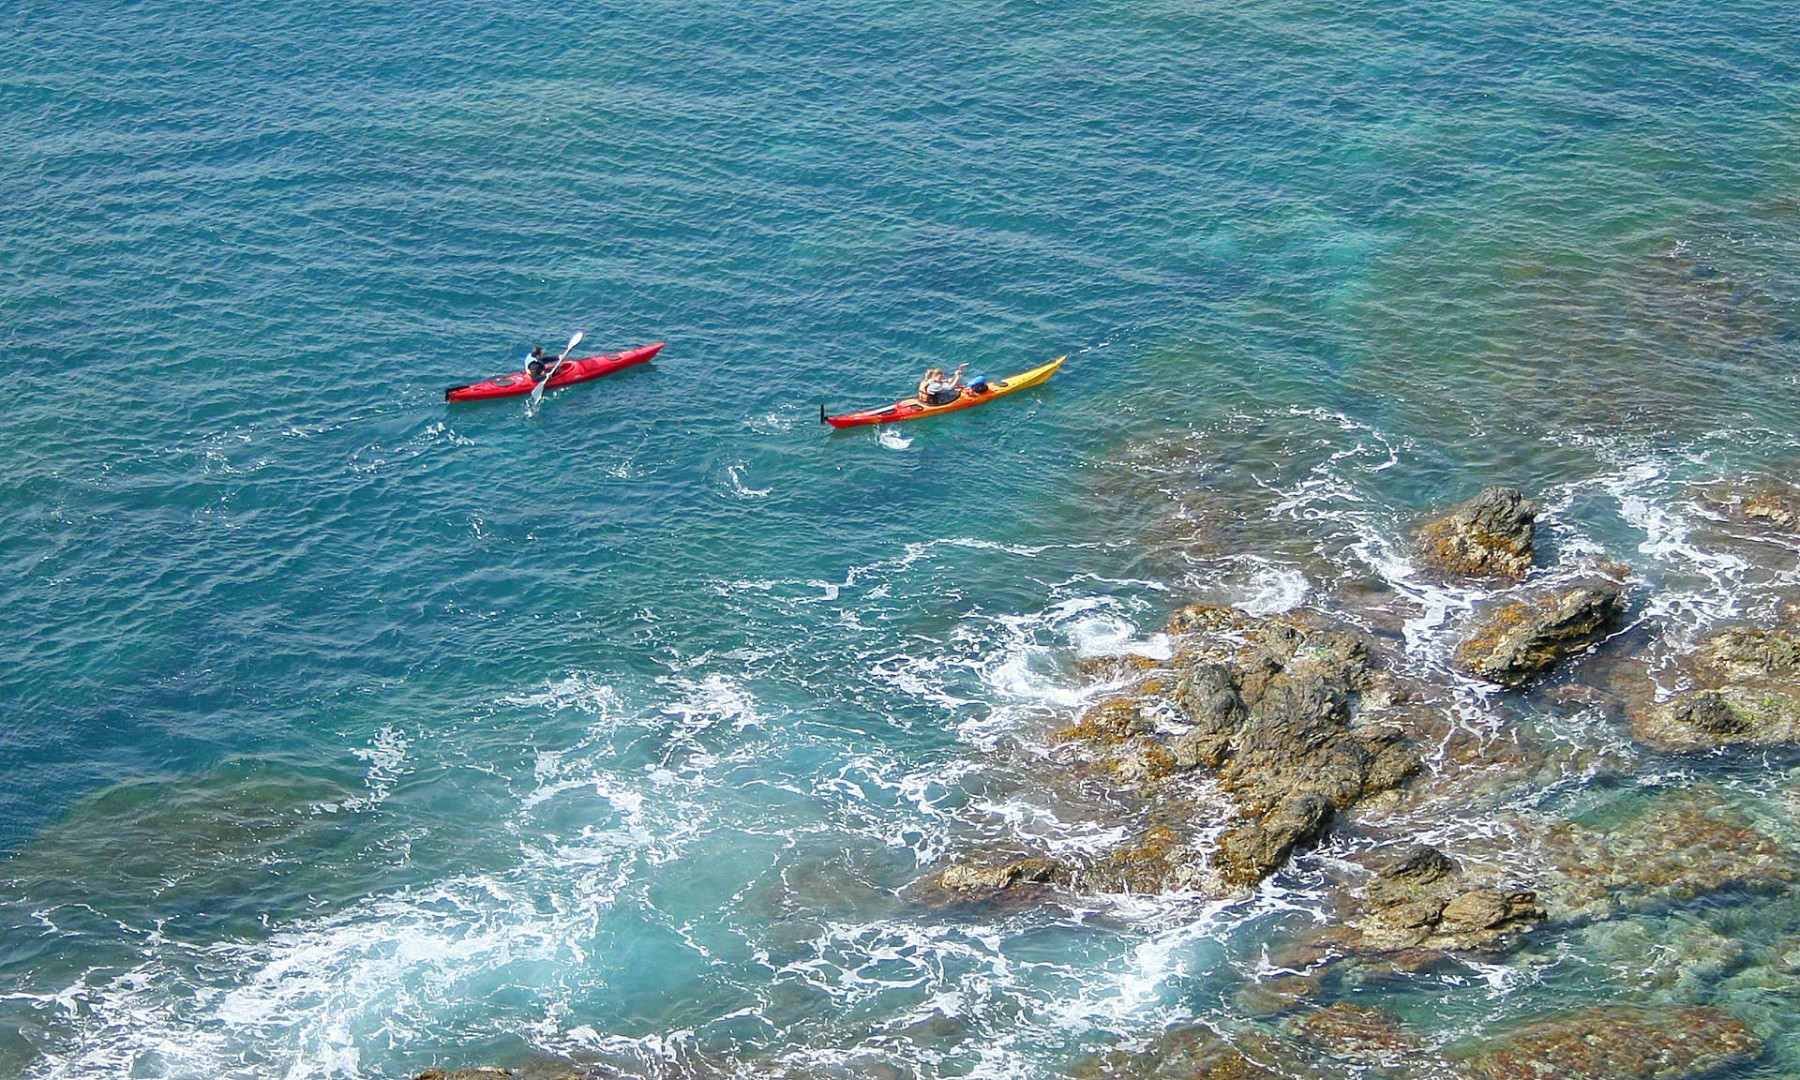 balade_kayak_de_mer_en_cote_vermeille_dans_les_pyrenees_orientales_2